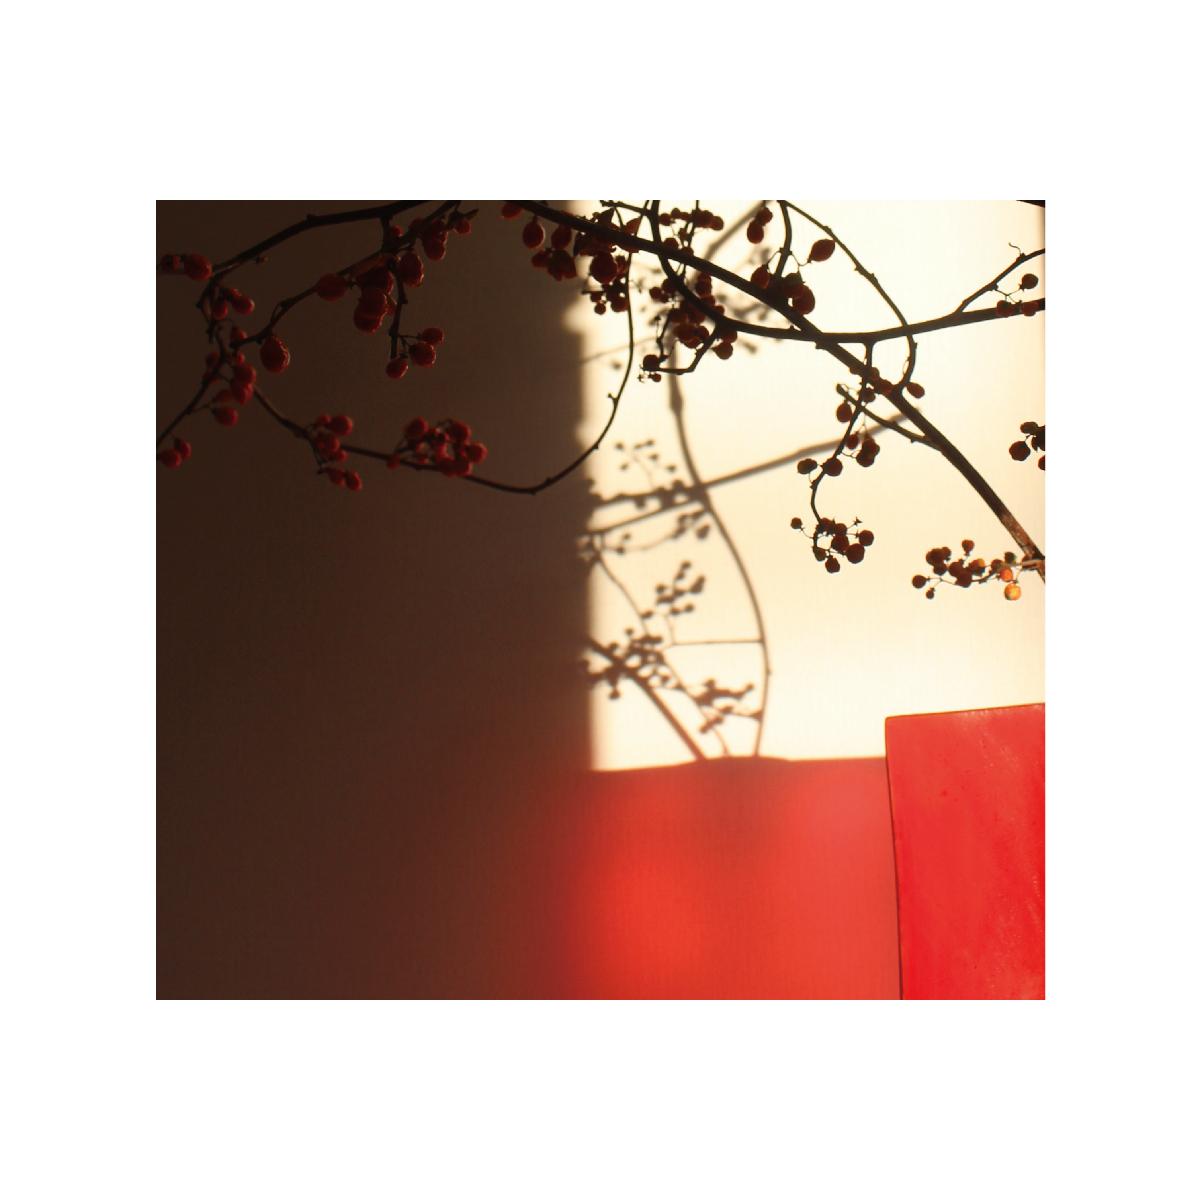 [ART WORK]赤い花器